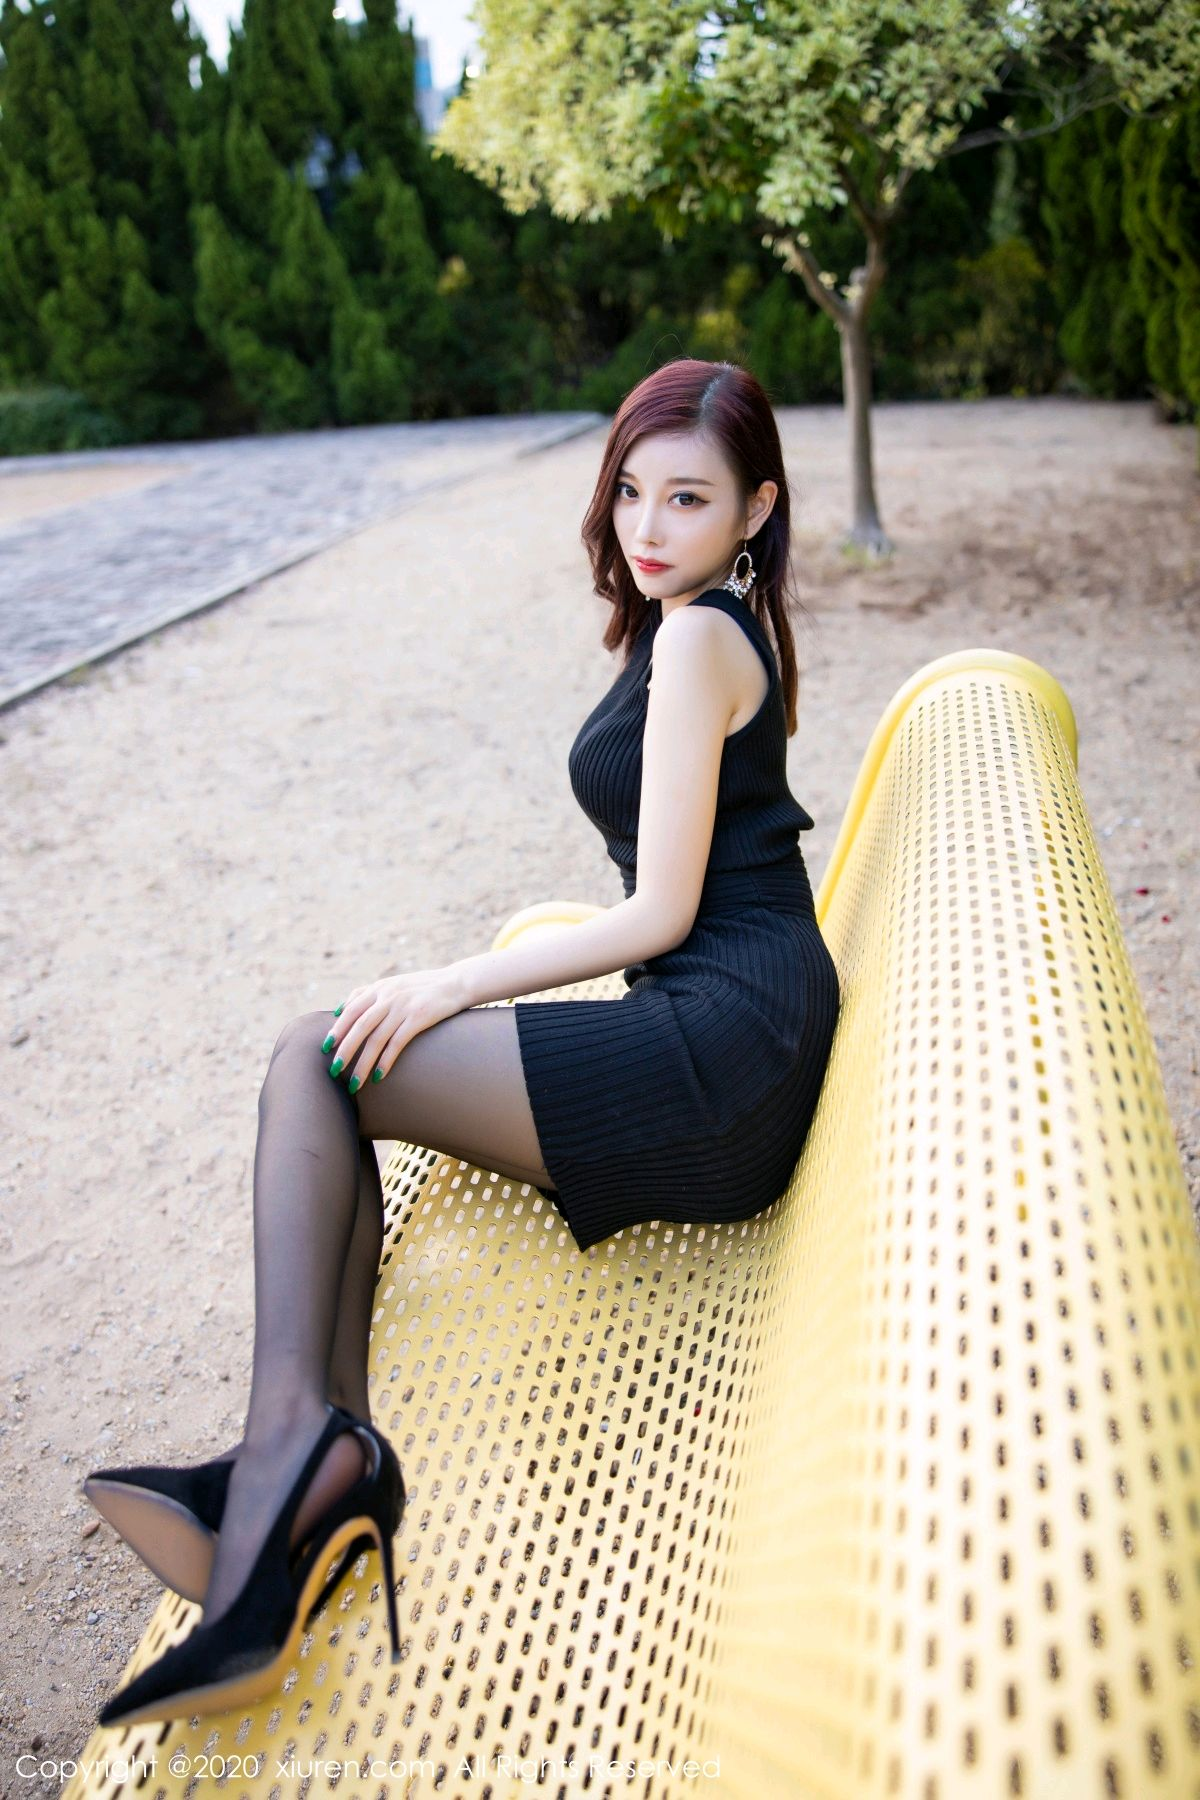 [XiuRen] Vol.2648 Yang Chen Chen 53P, Black Silk, Outdoor, Xiuren, Yang Chen Chen